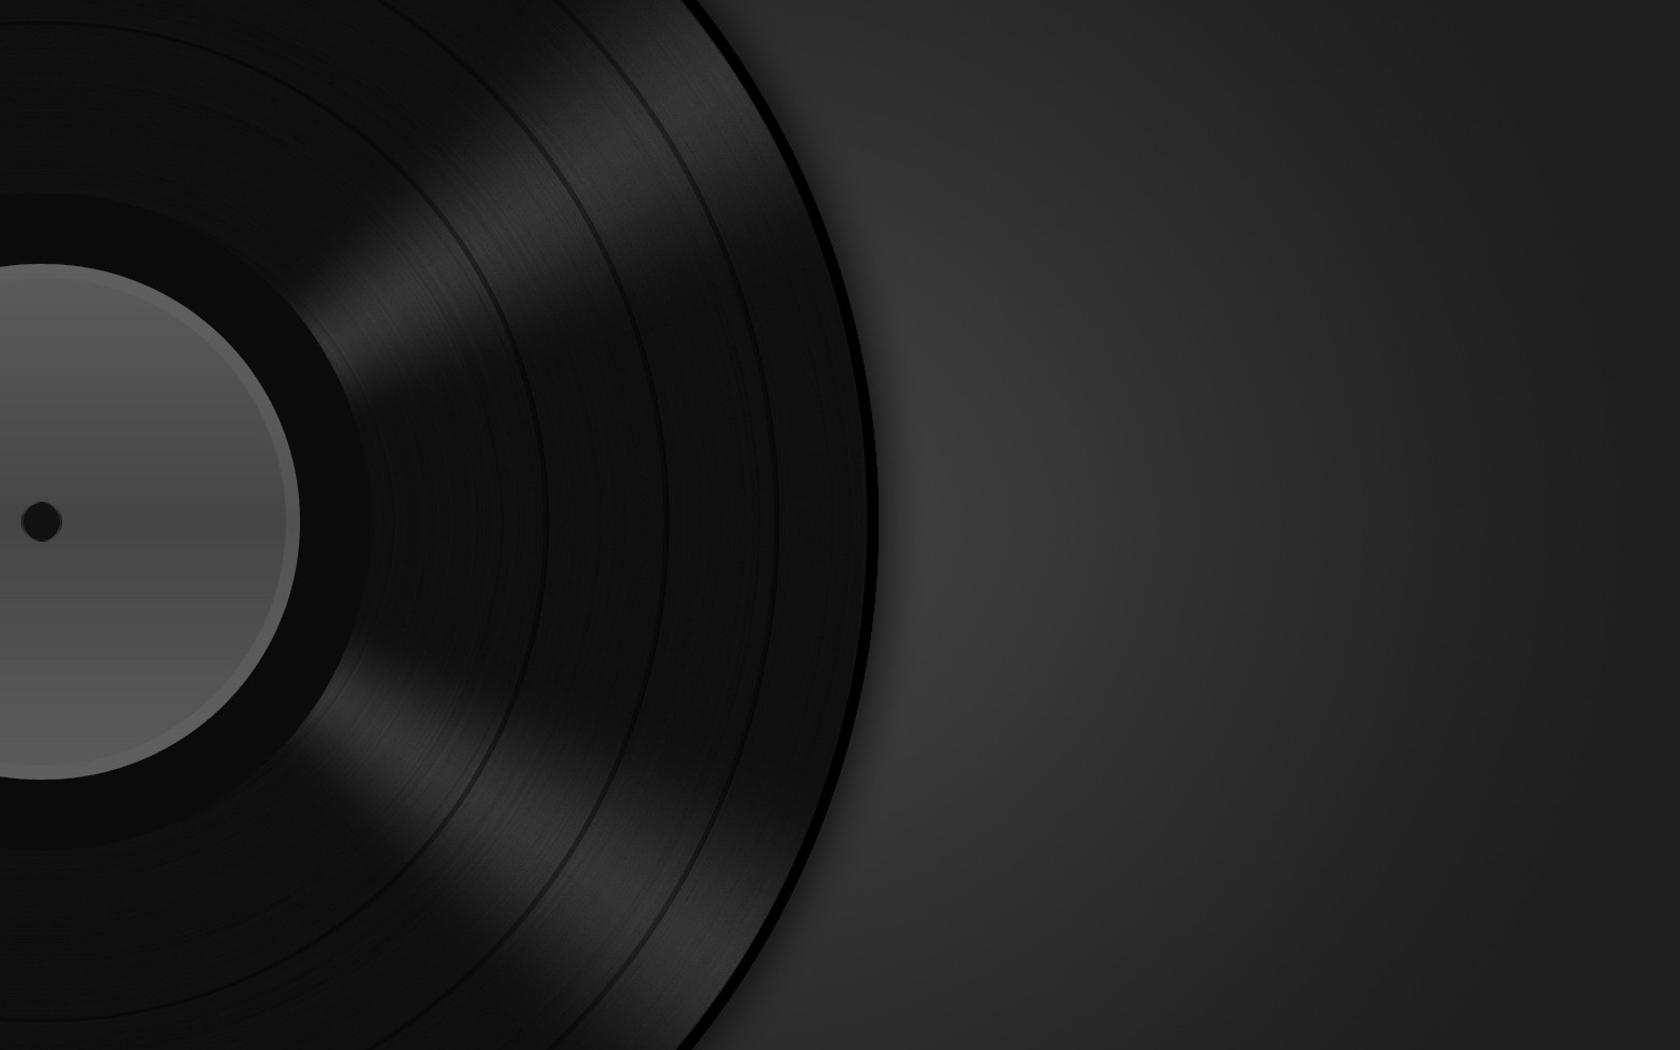 1680x1050 Music Record wallpaper